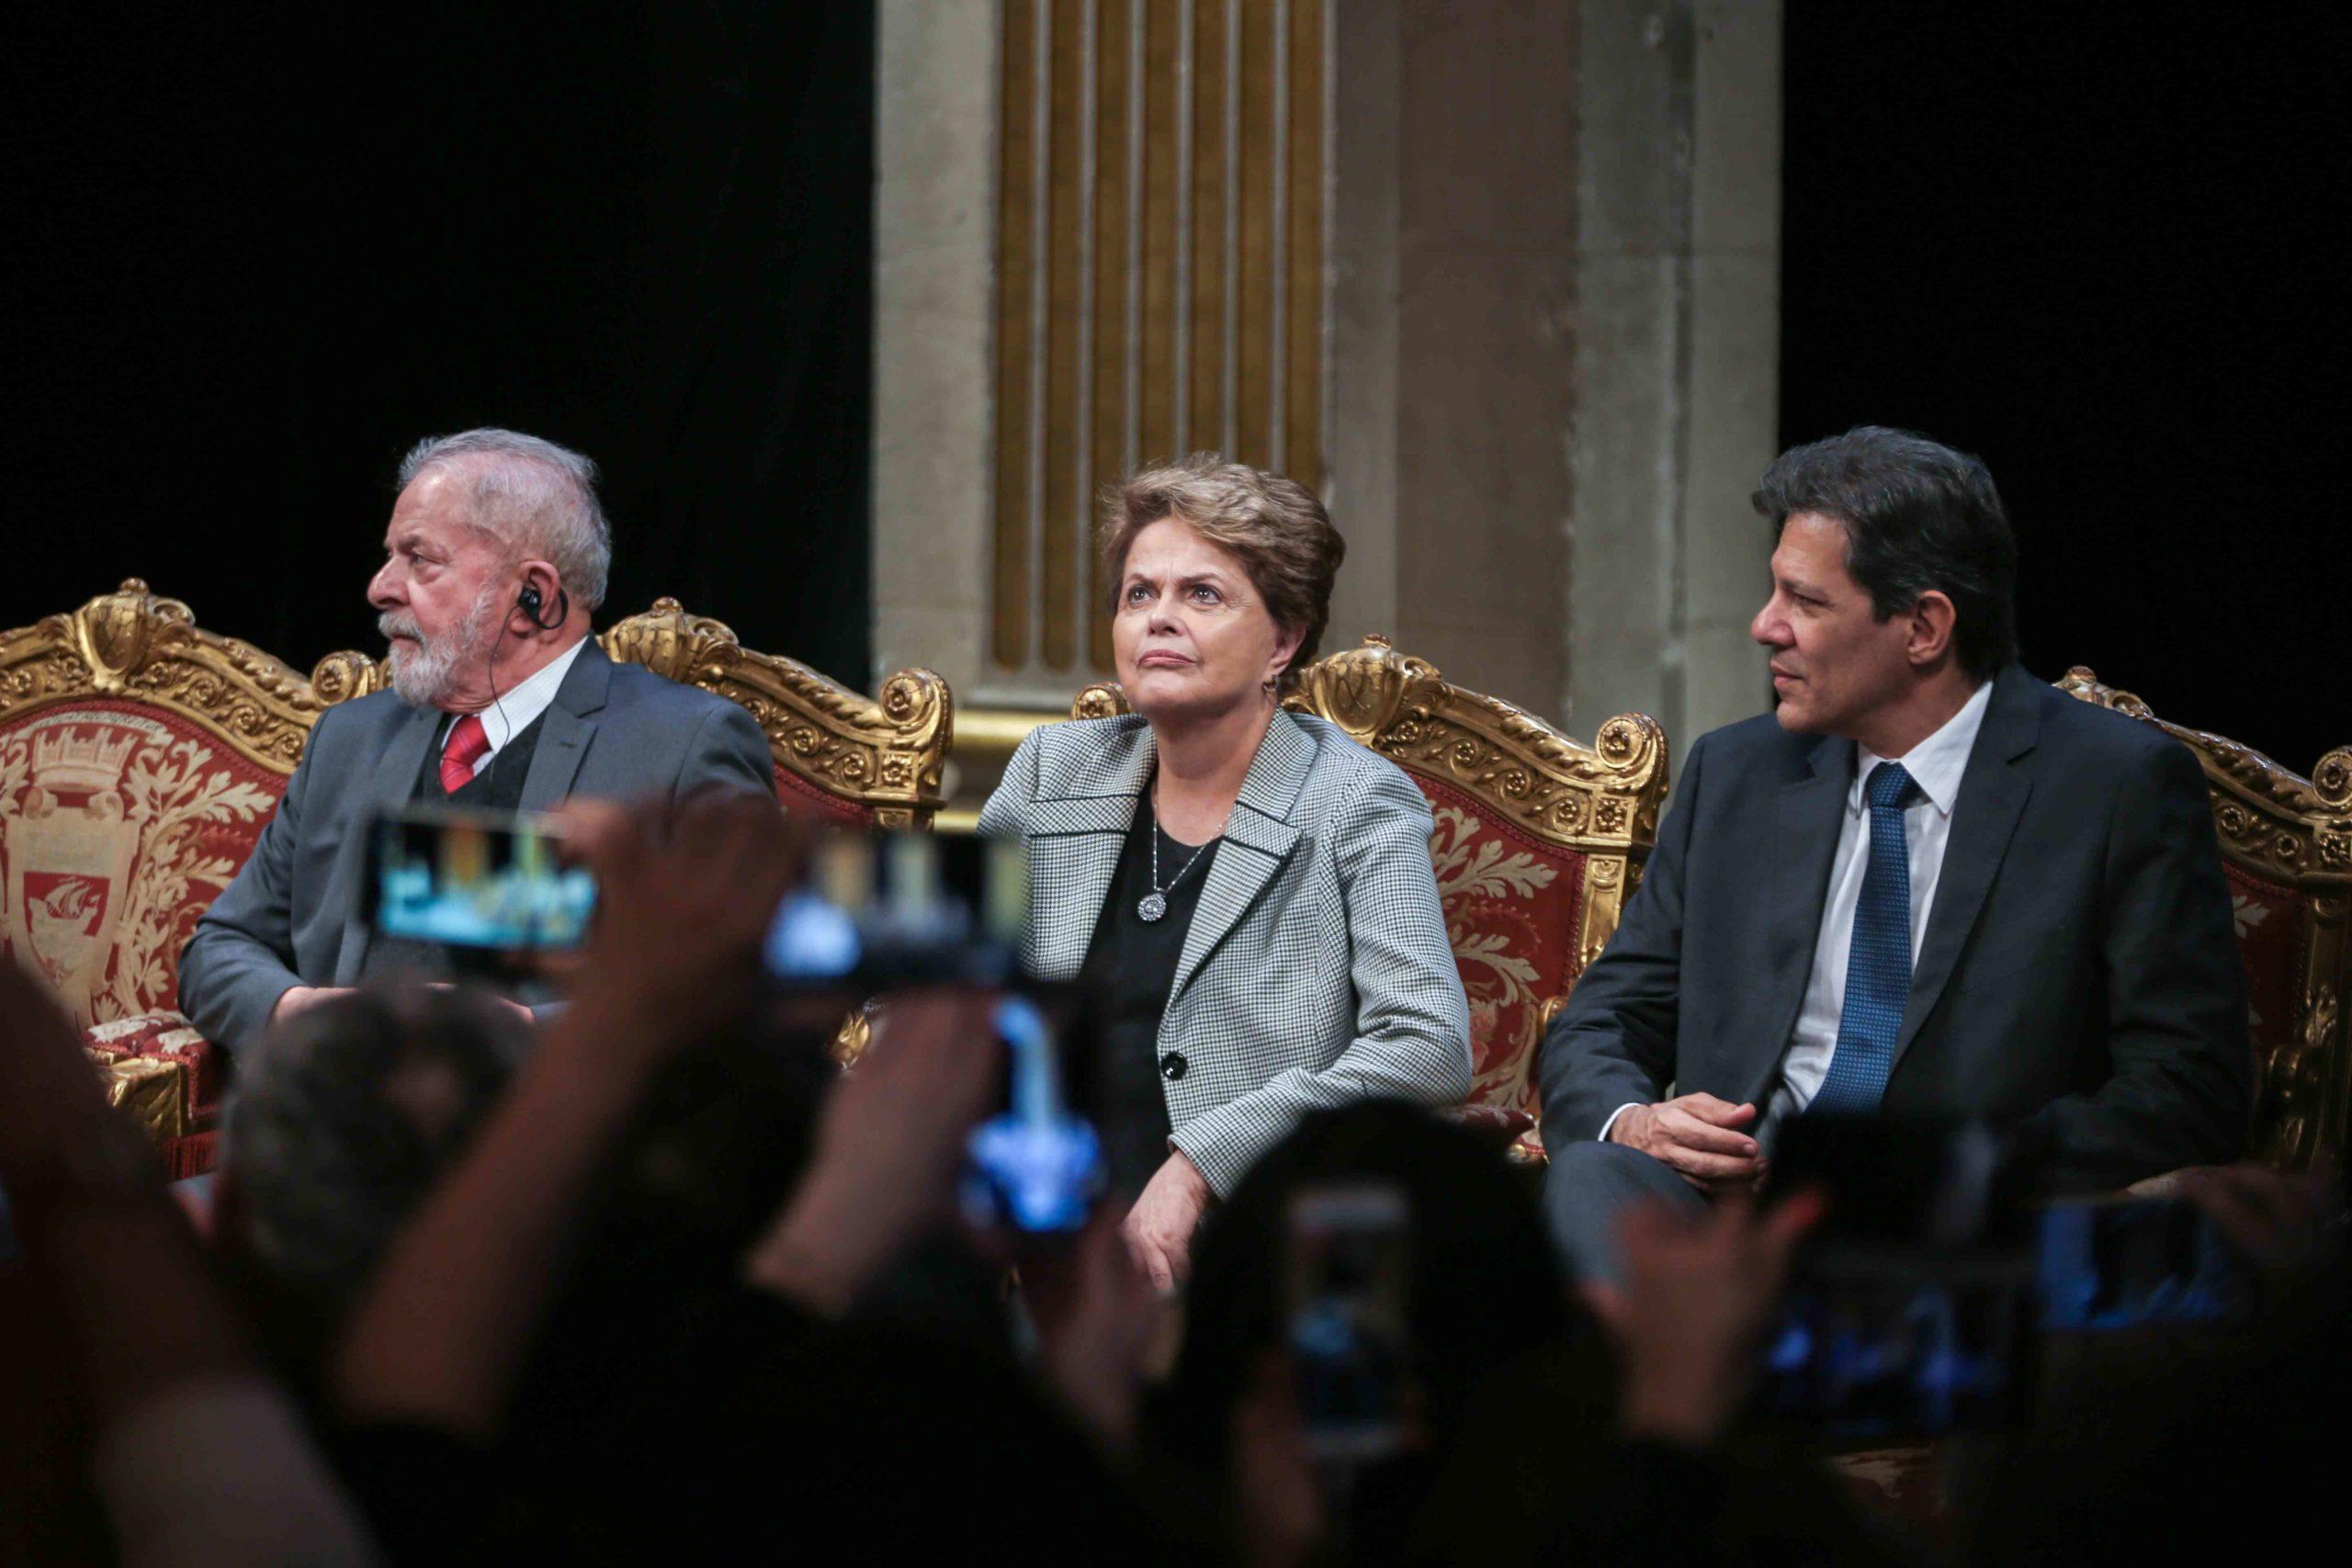 (Lto R) Former Brazilian president Luiz Inacio Lula da Silva, Former Brazilian president Dilma Rousseff and former Sao Paolo Mayor Fernando Hadda take part in a ceremony at the City Hall of Paris, on March 2, 2020, during wich the President Lula da Silva w